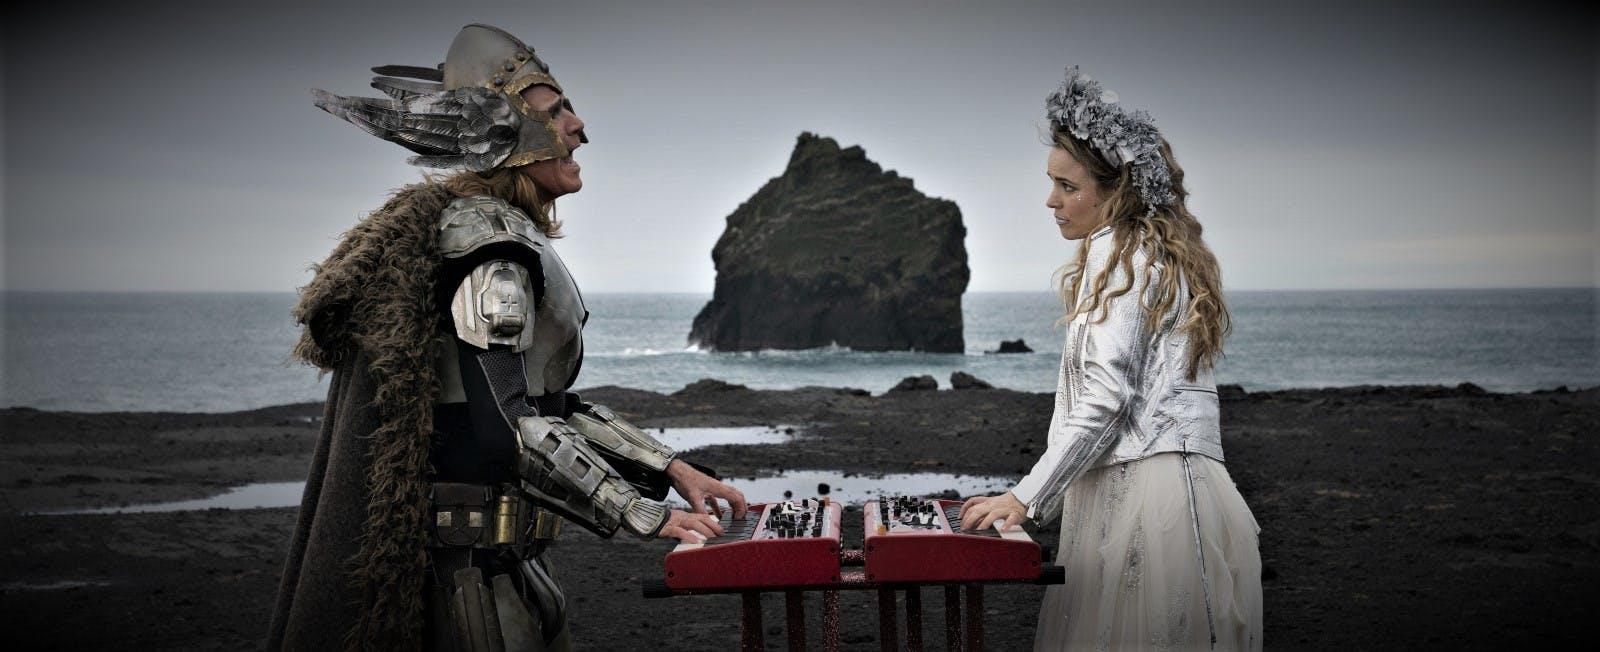 De bästa romantiska komedierna just nu